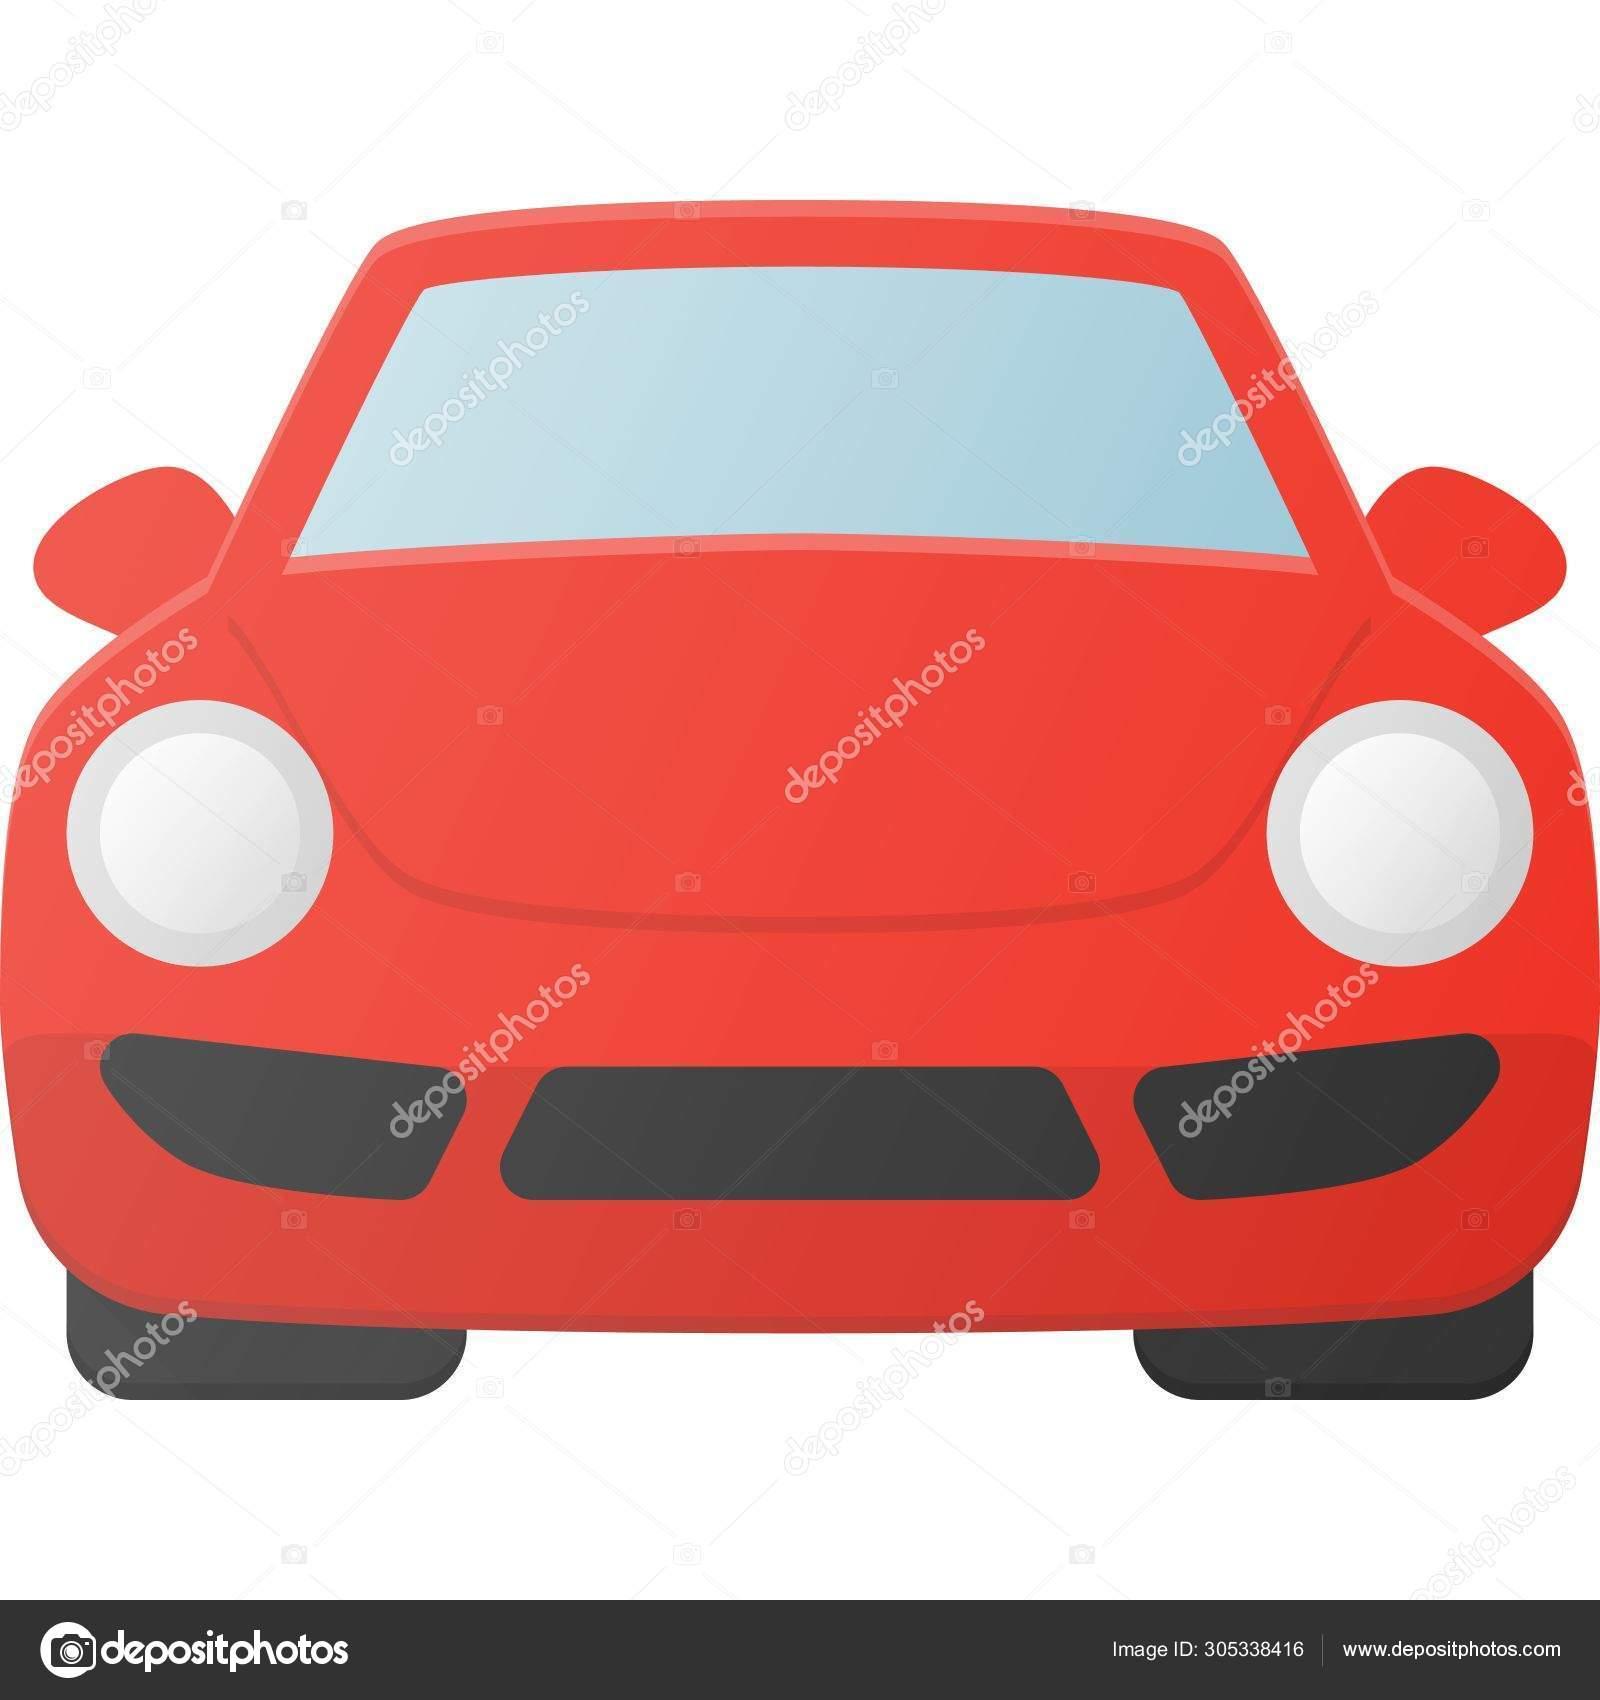 ᐈ 911 Stock Illustrations Royalty Free Porsche Vectors Download On Depositphotos